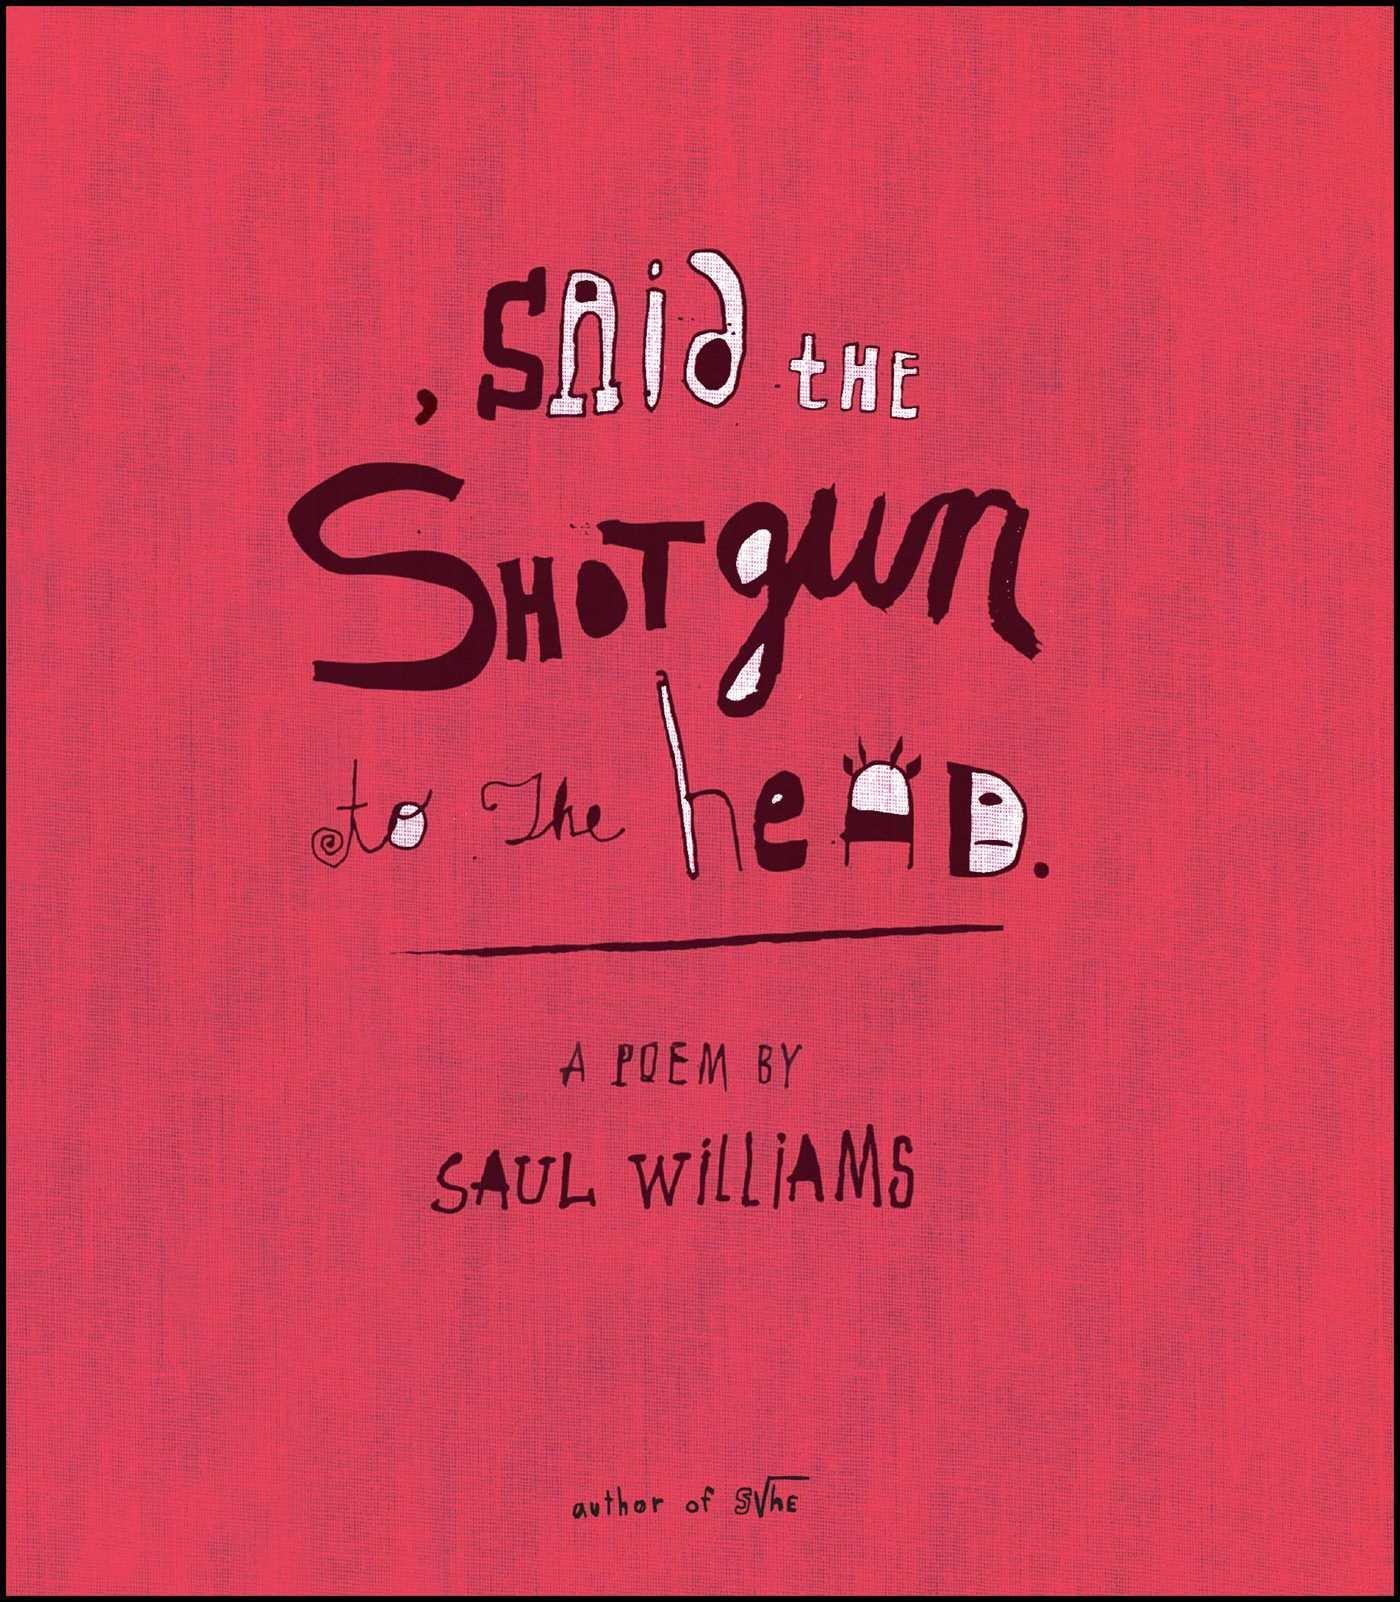 Said the Shotgun to the Head  - a poem by Saul Williams